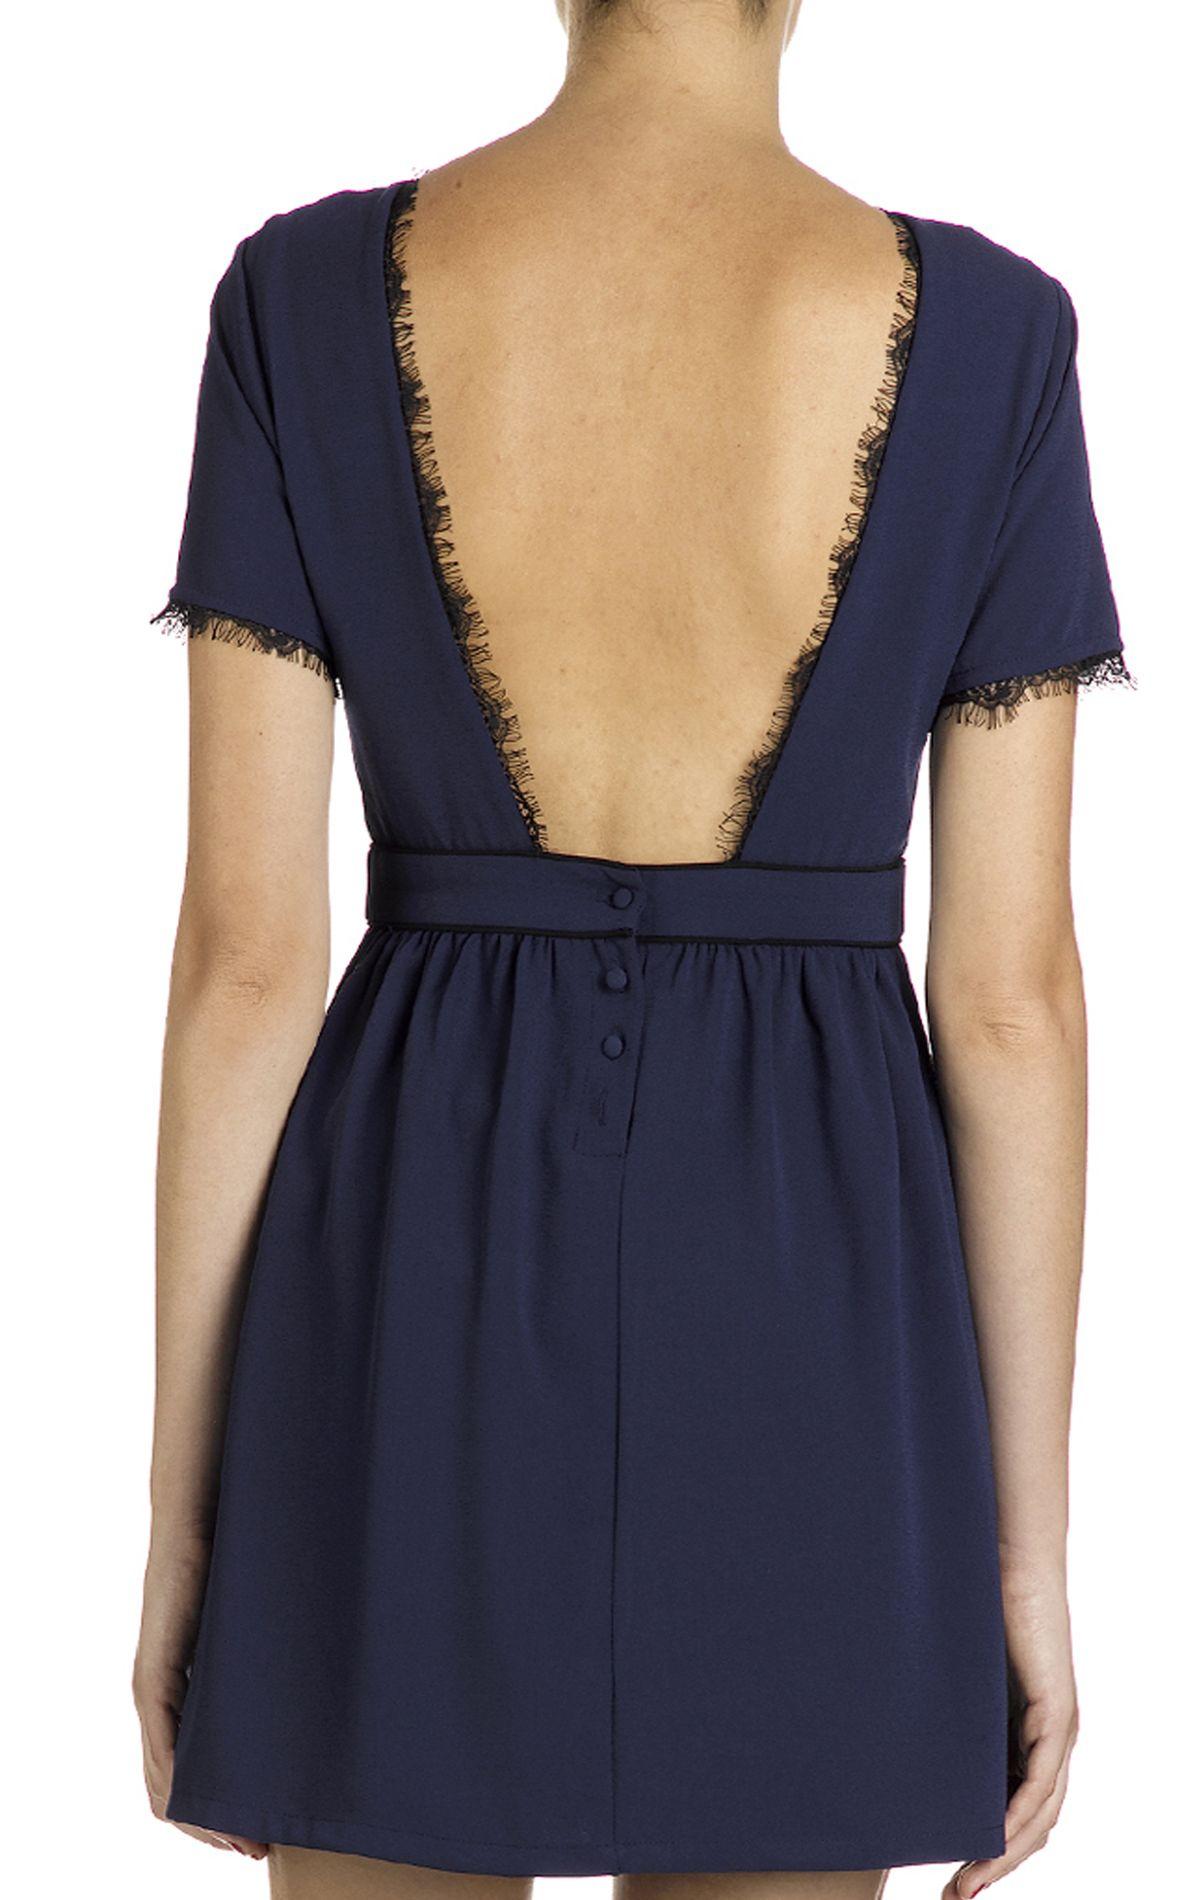 Robe taille haute Bleu by SUNCOO                                                                                                                                                      Plus